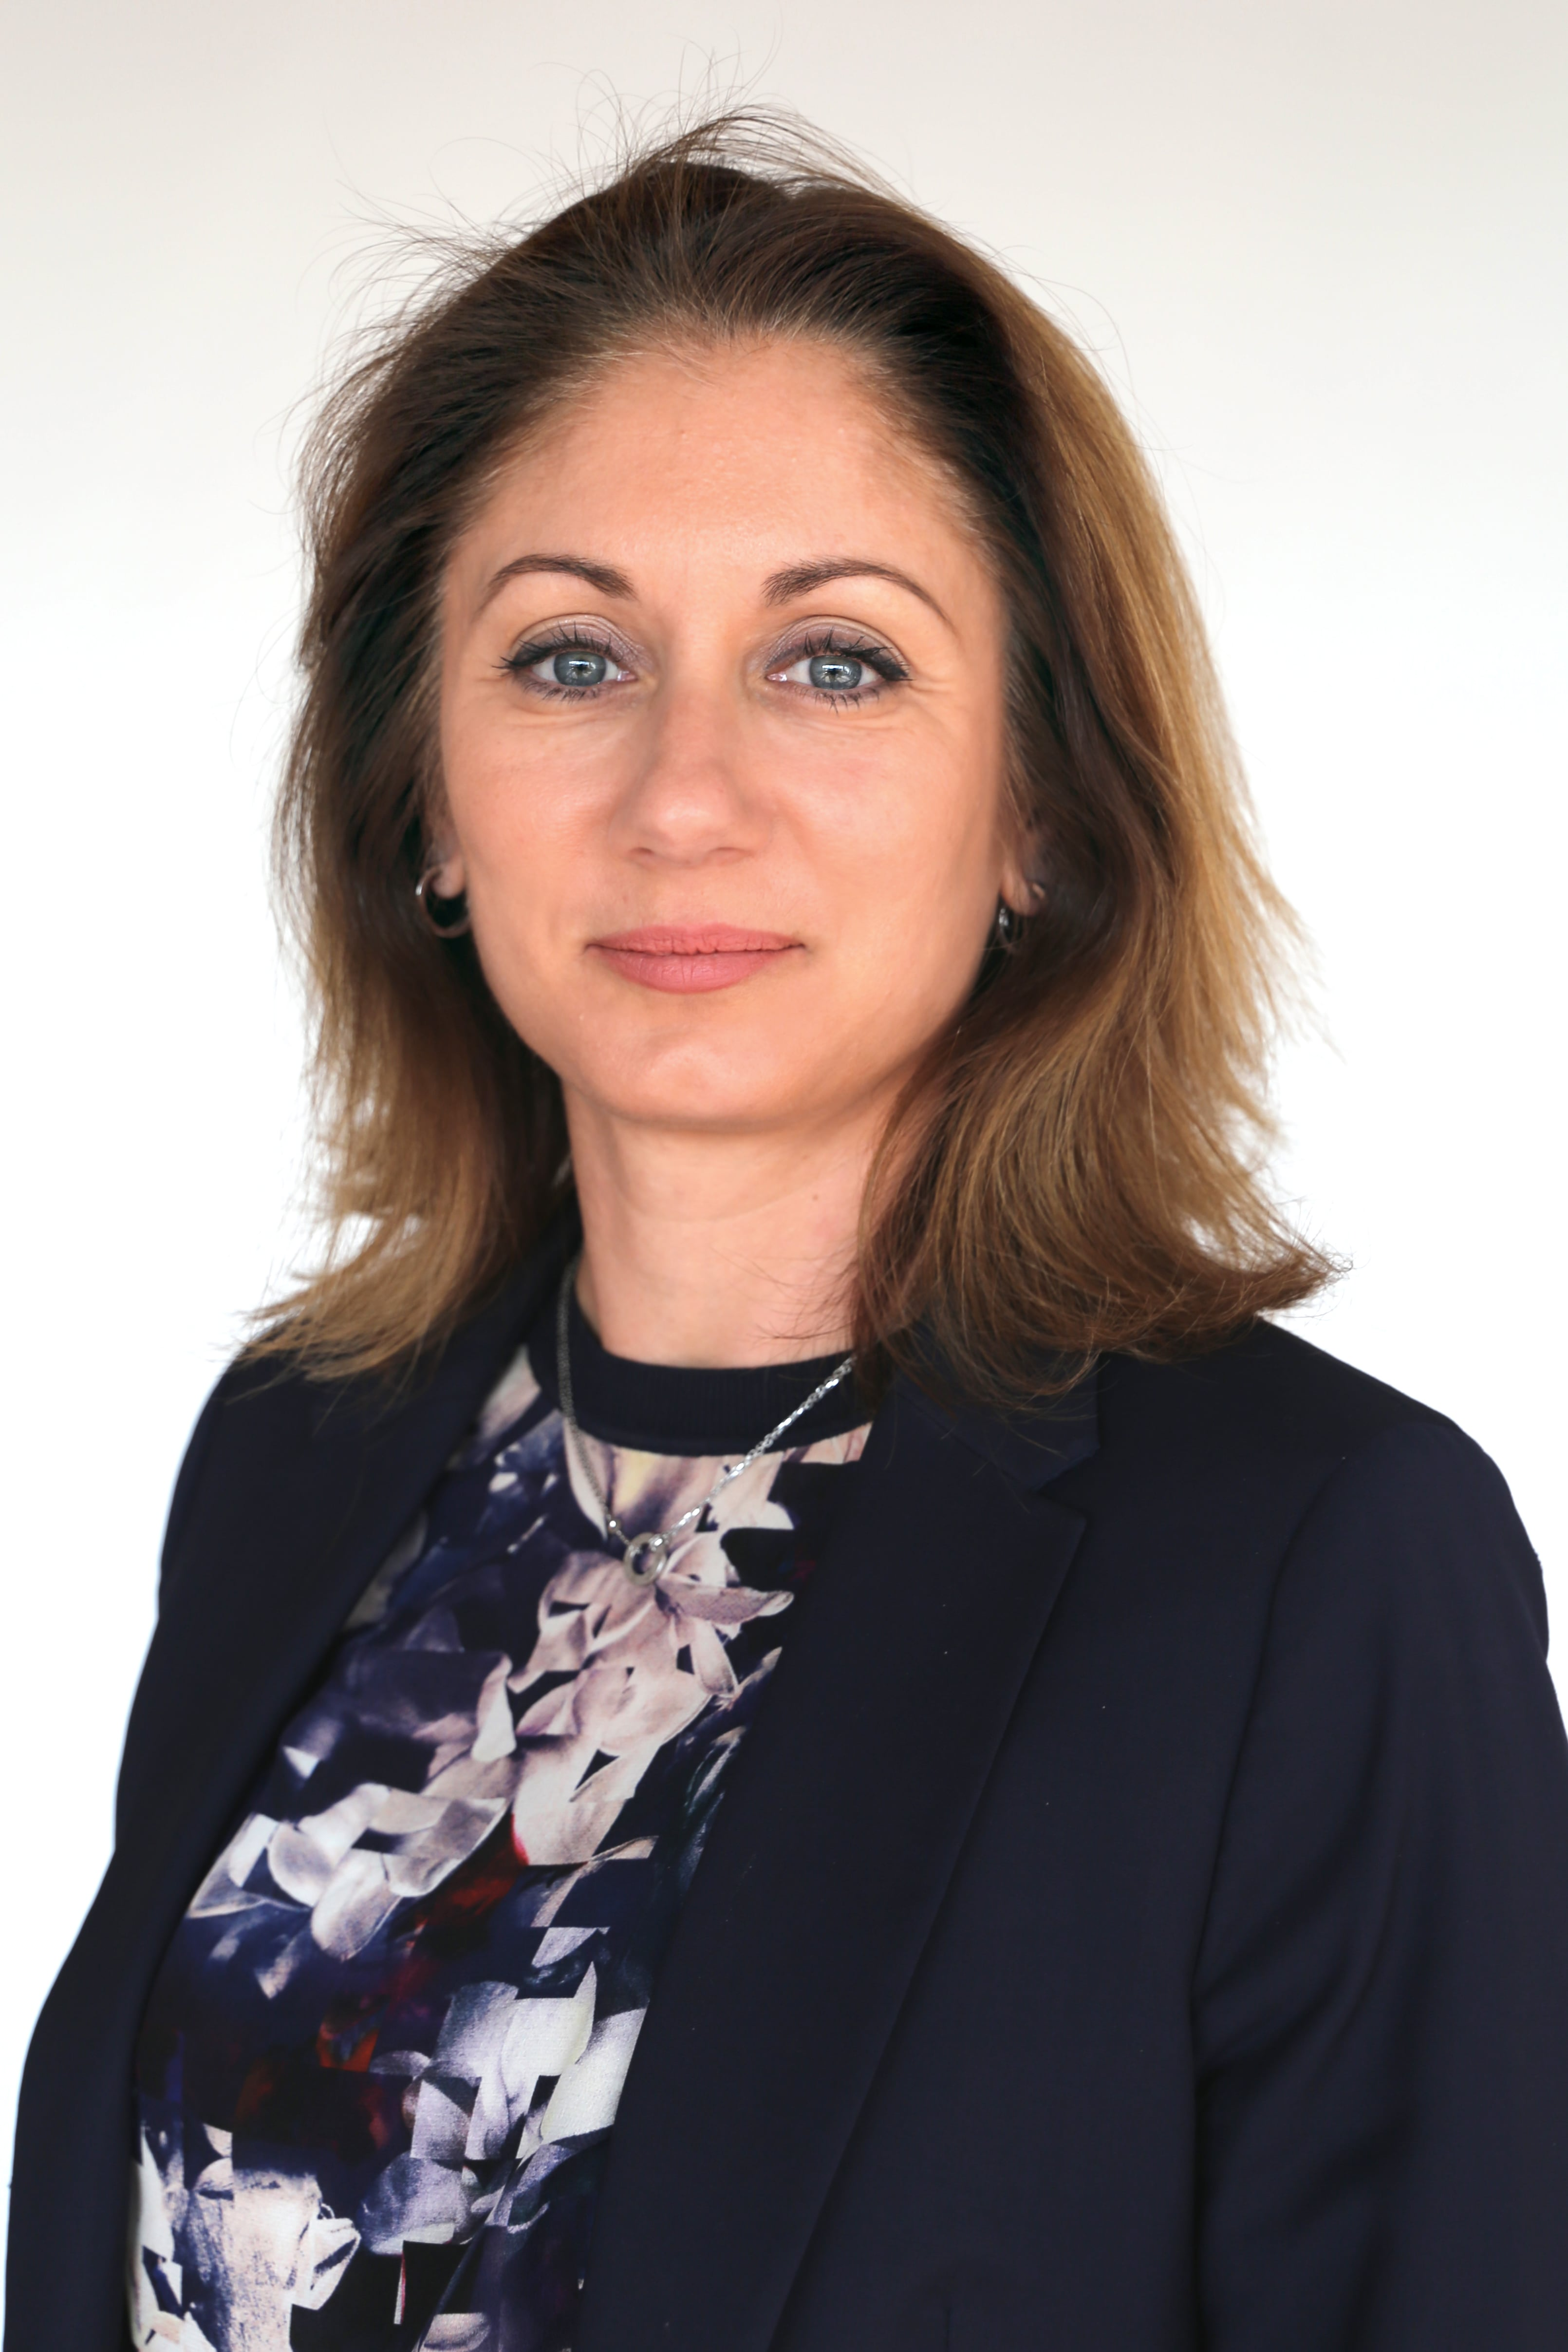 Sophie Spring - Enseignant-chercheur Montpellier Management